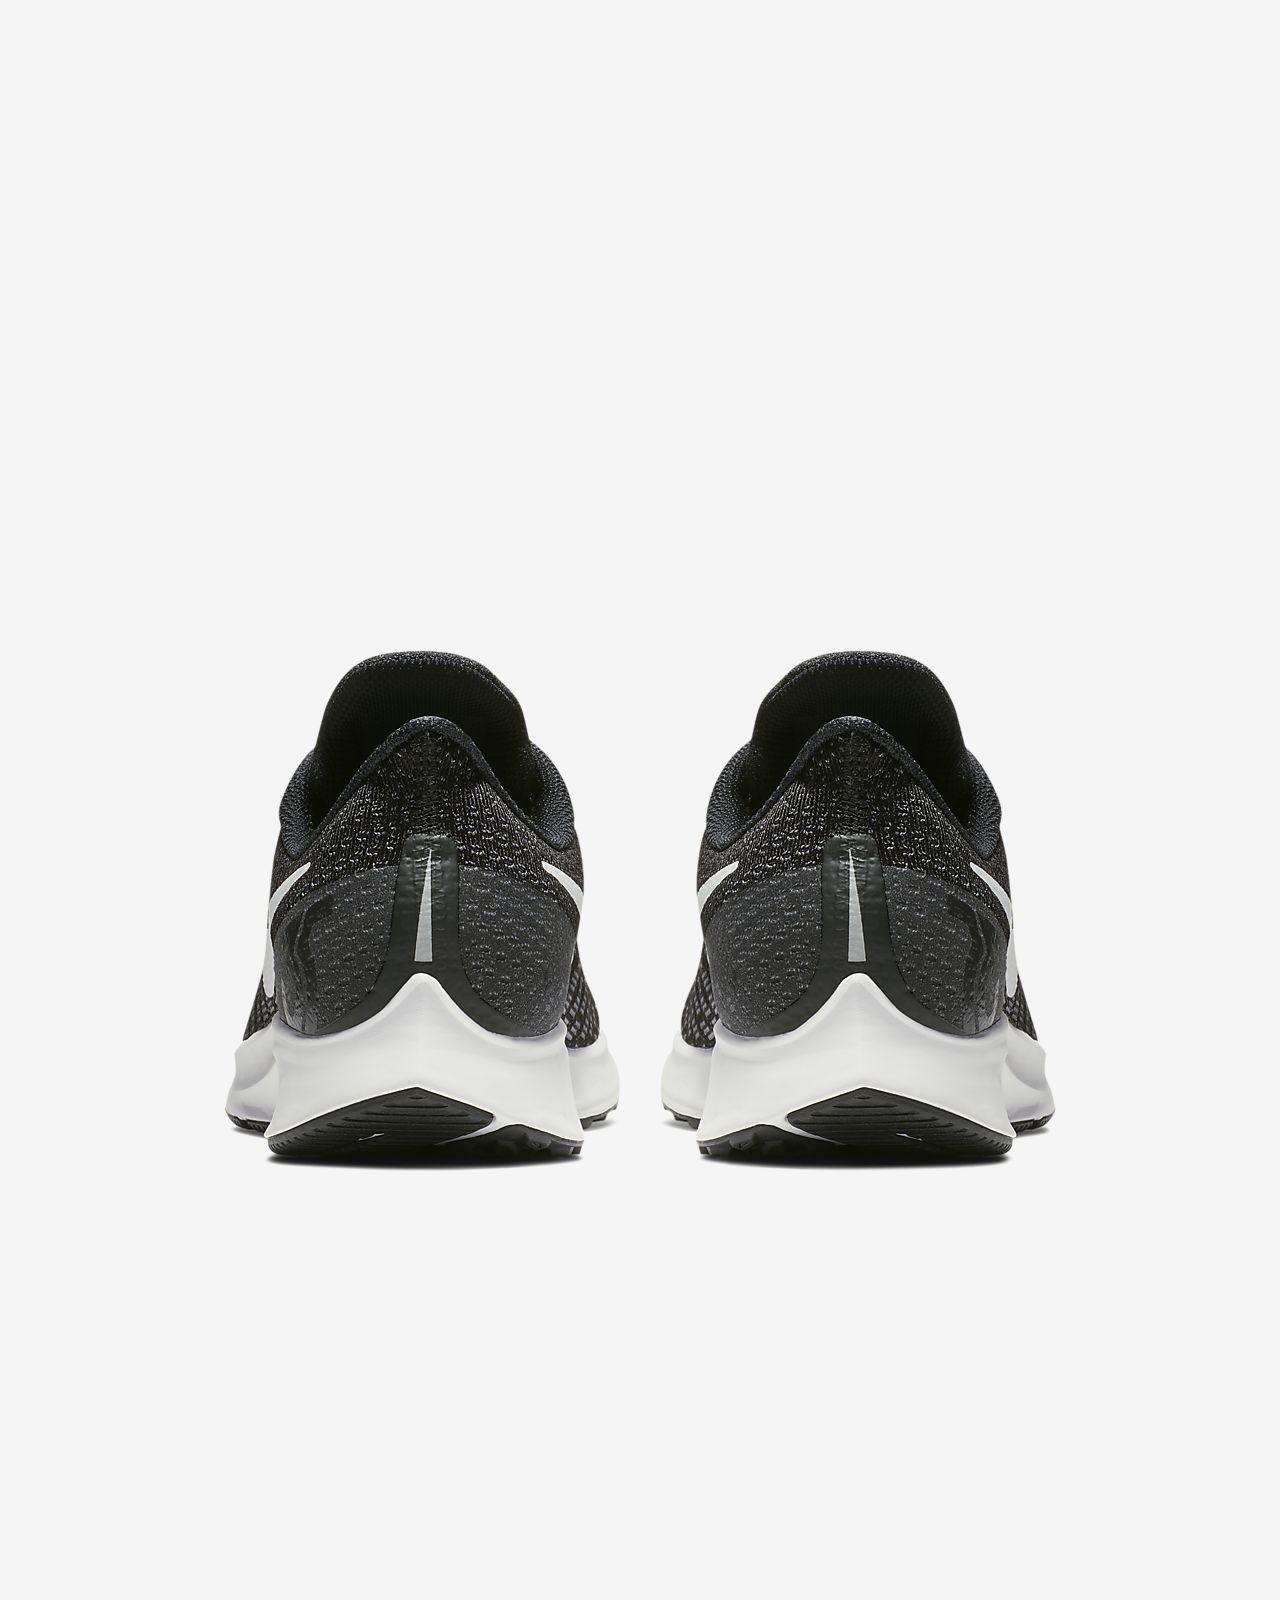 promo code e6700 c77c7 ... Chaussure de running Nike Air Zoom Pegasus 35 pour Homme